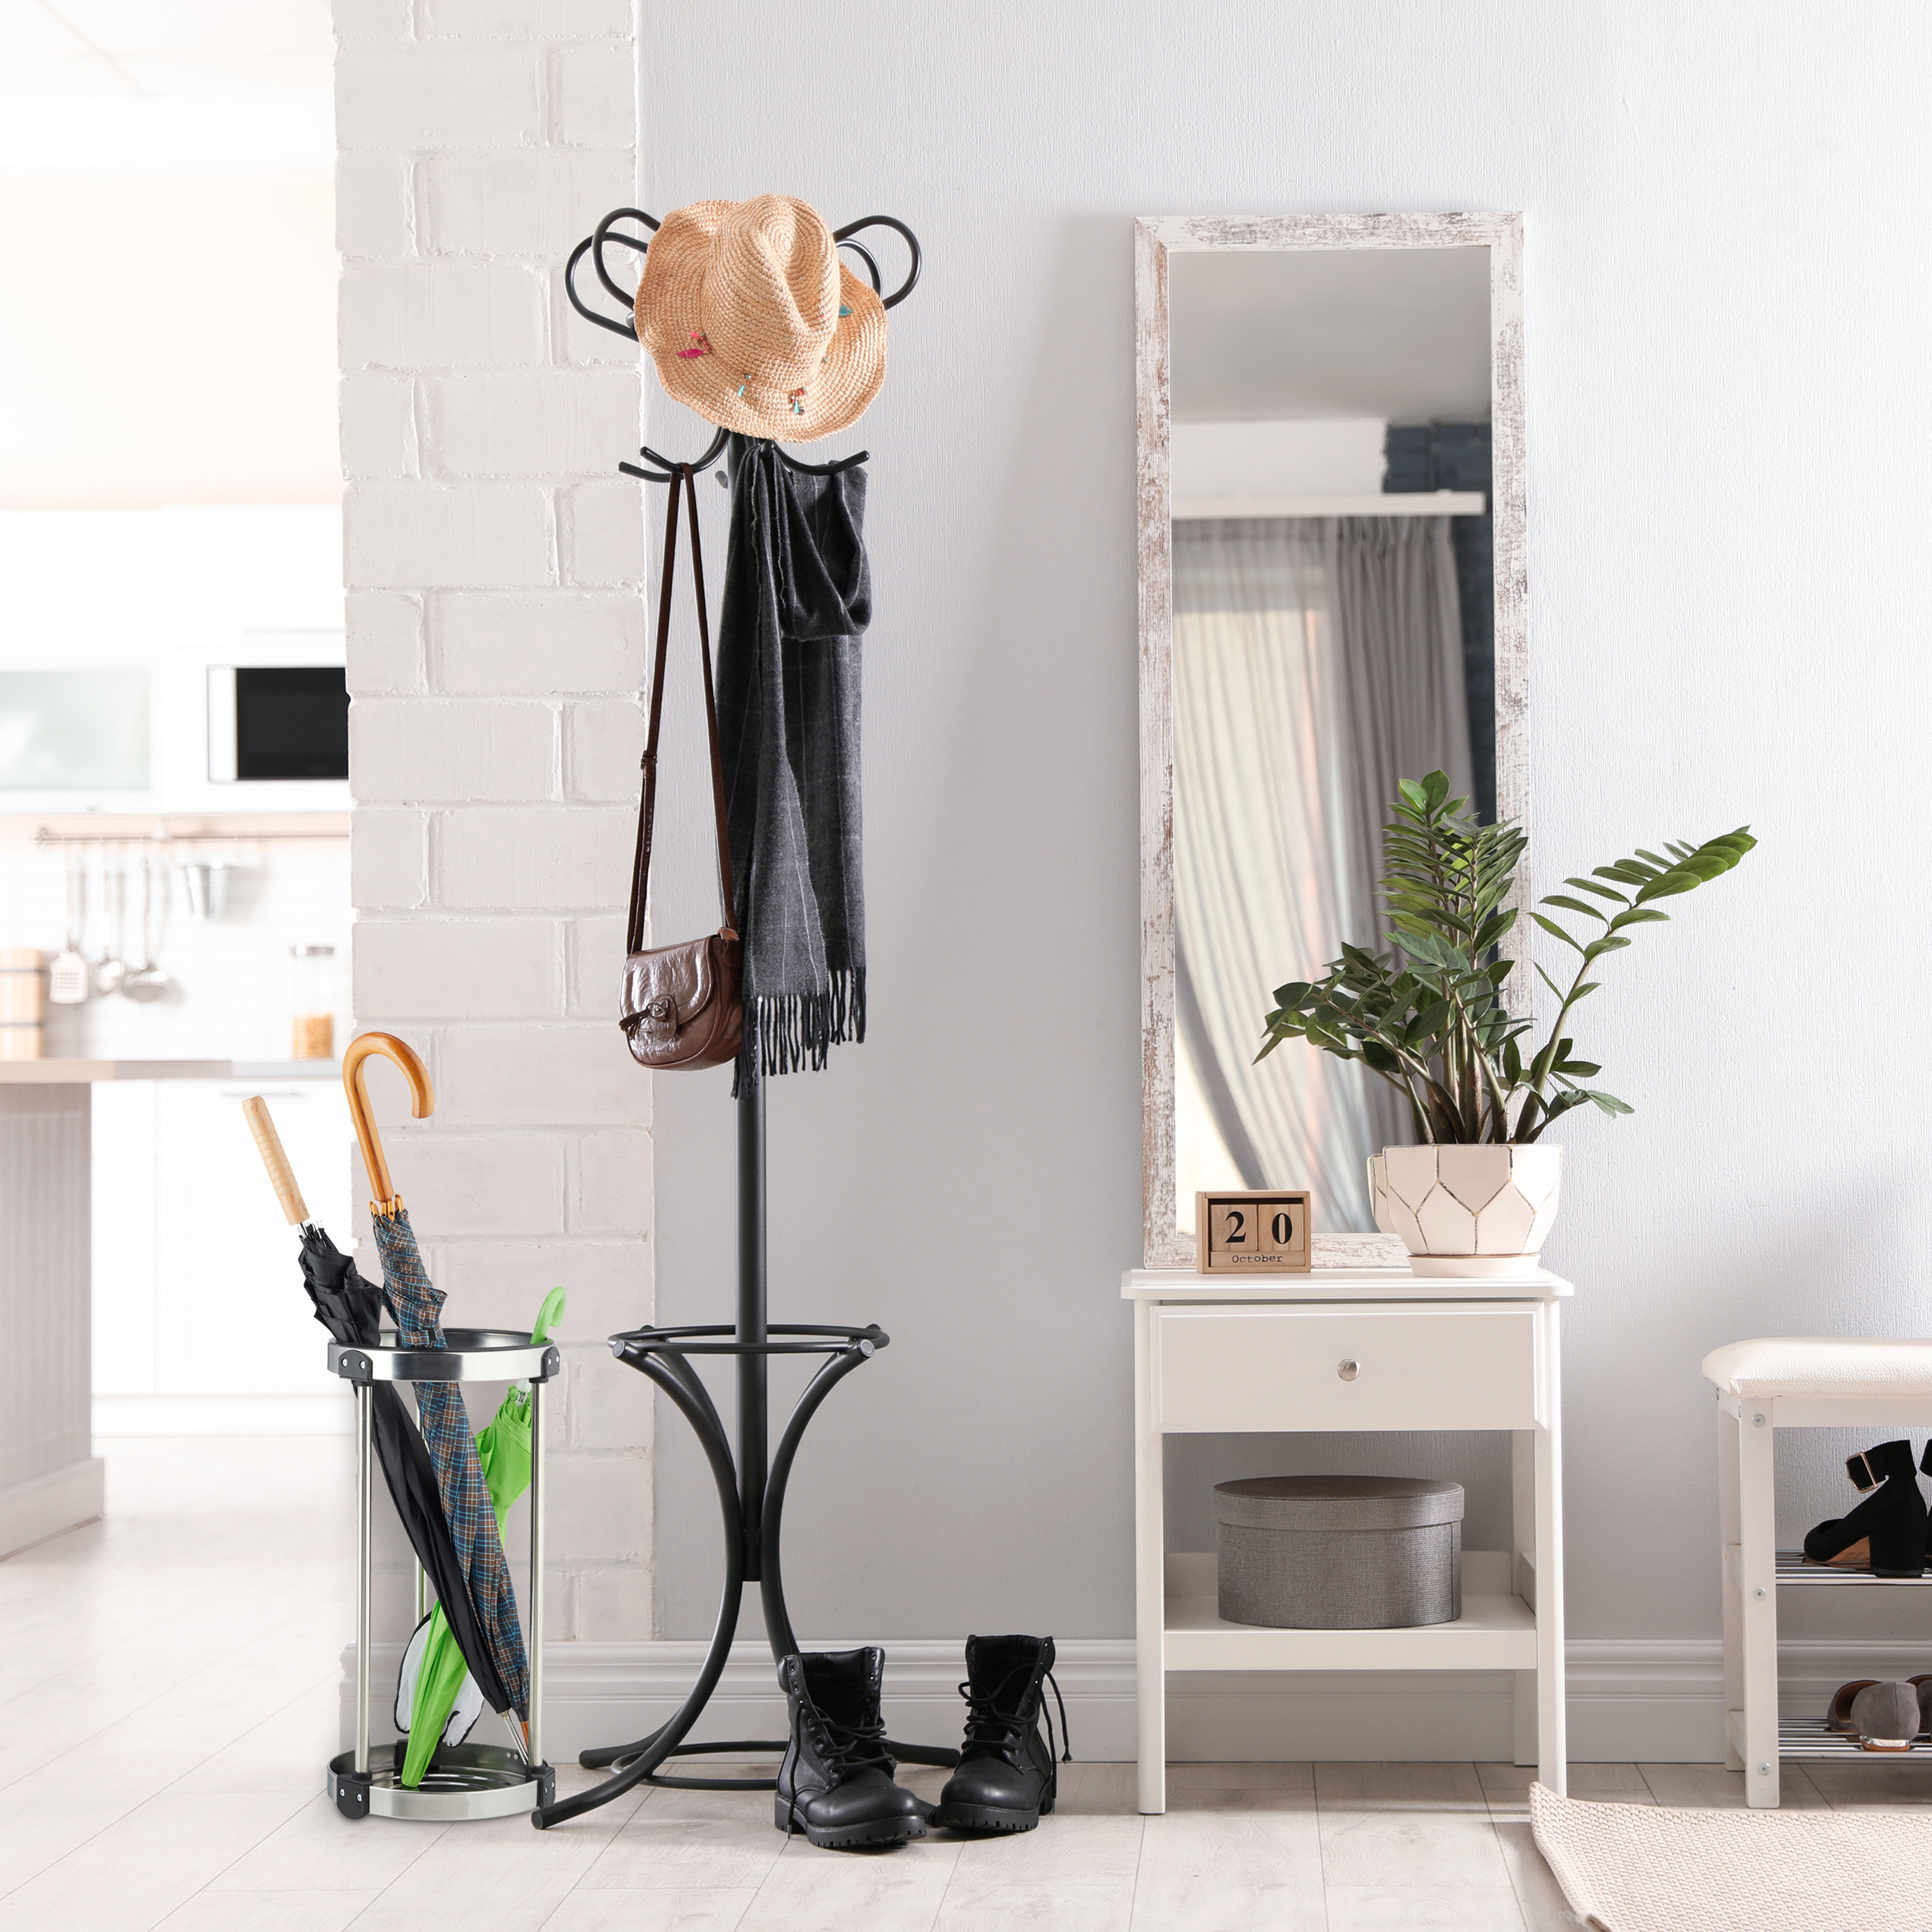 schirmst nder edelstahl schirmhalter regenschirmhalter. Black Bedroom Furniture Sets. Home Design Ideas